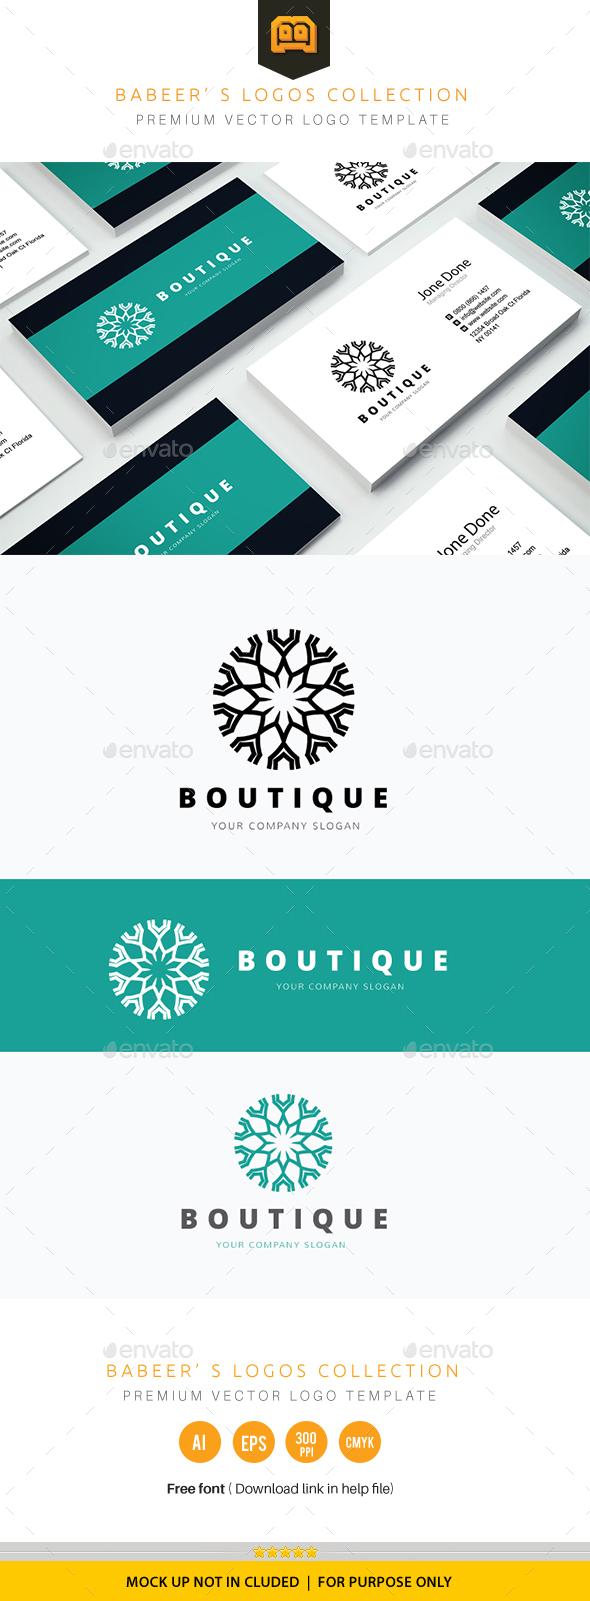 Boutique Hotel Logo